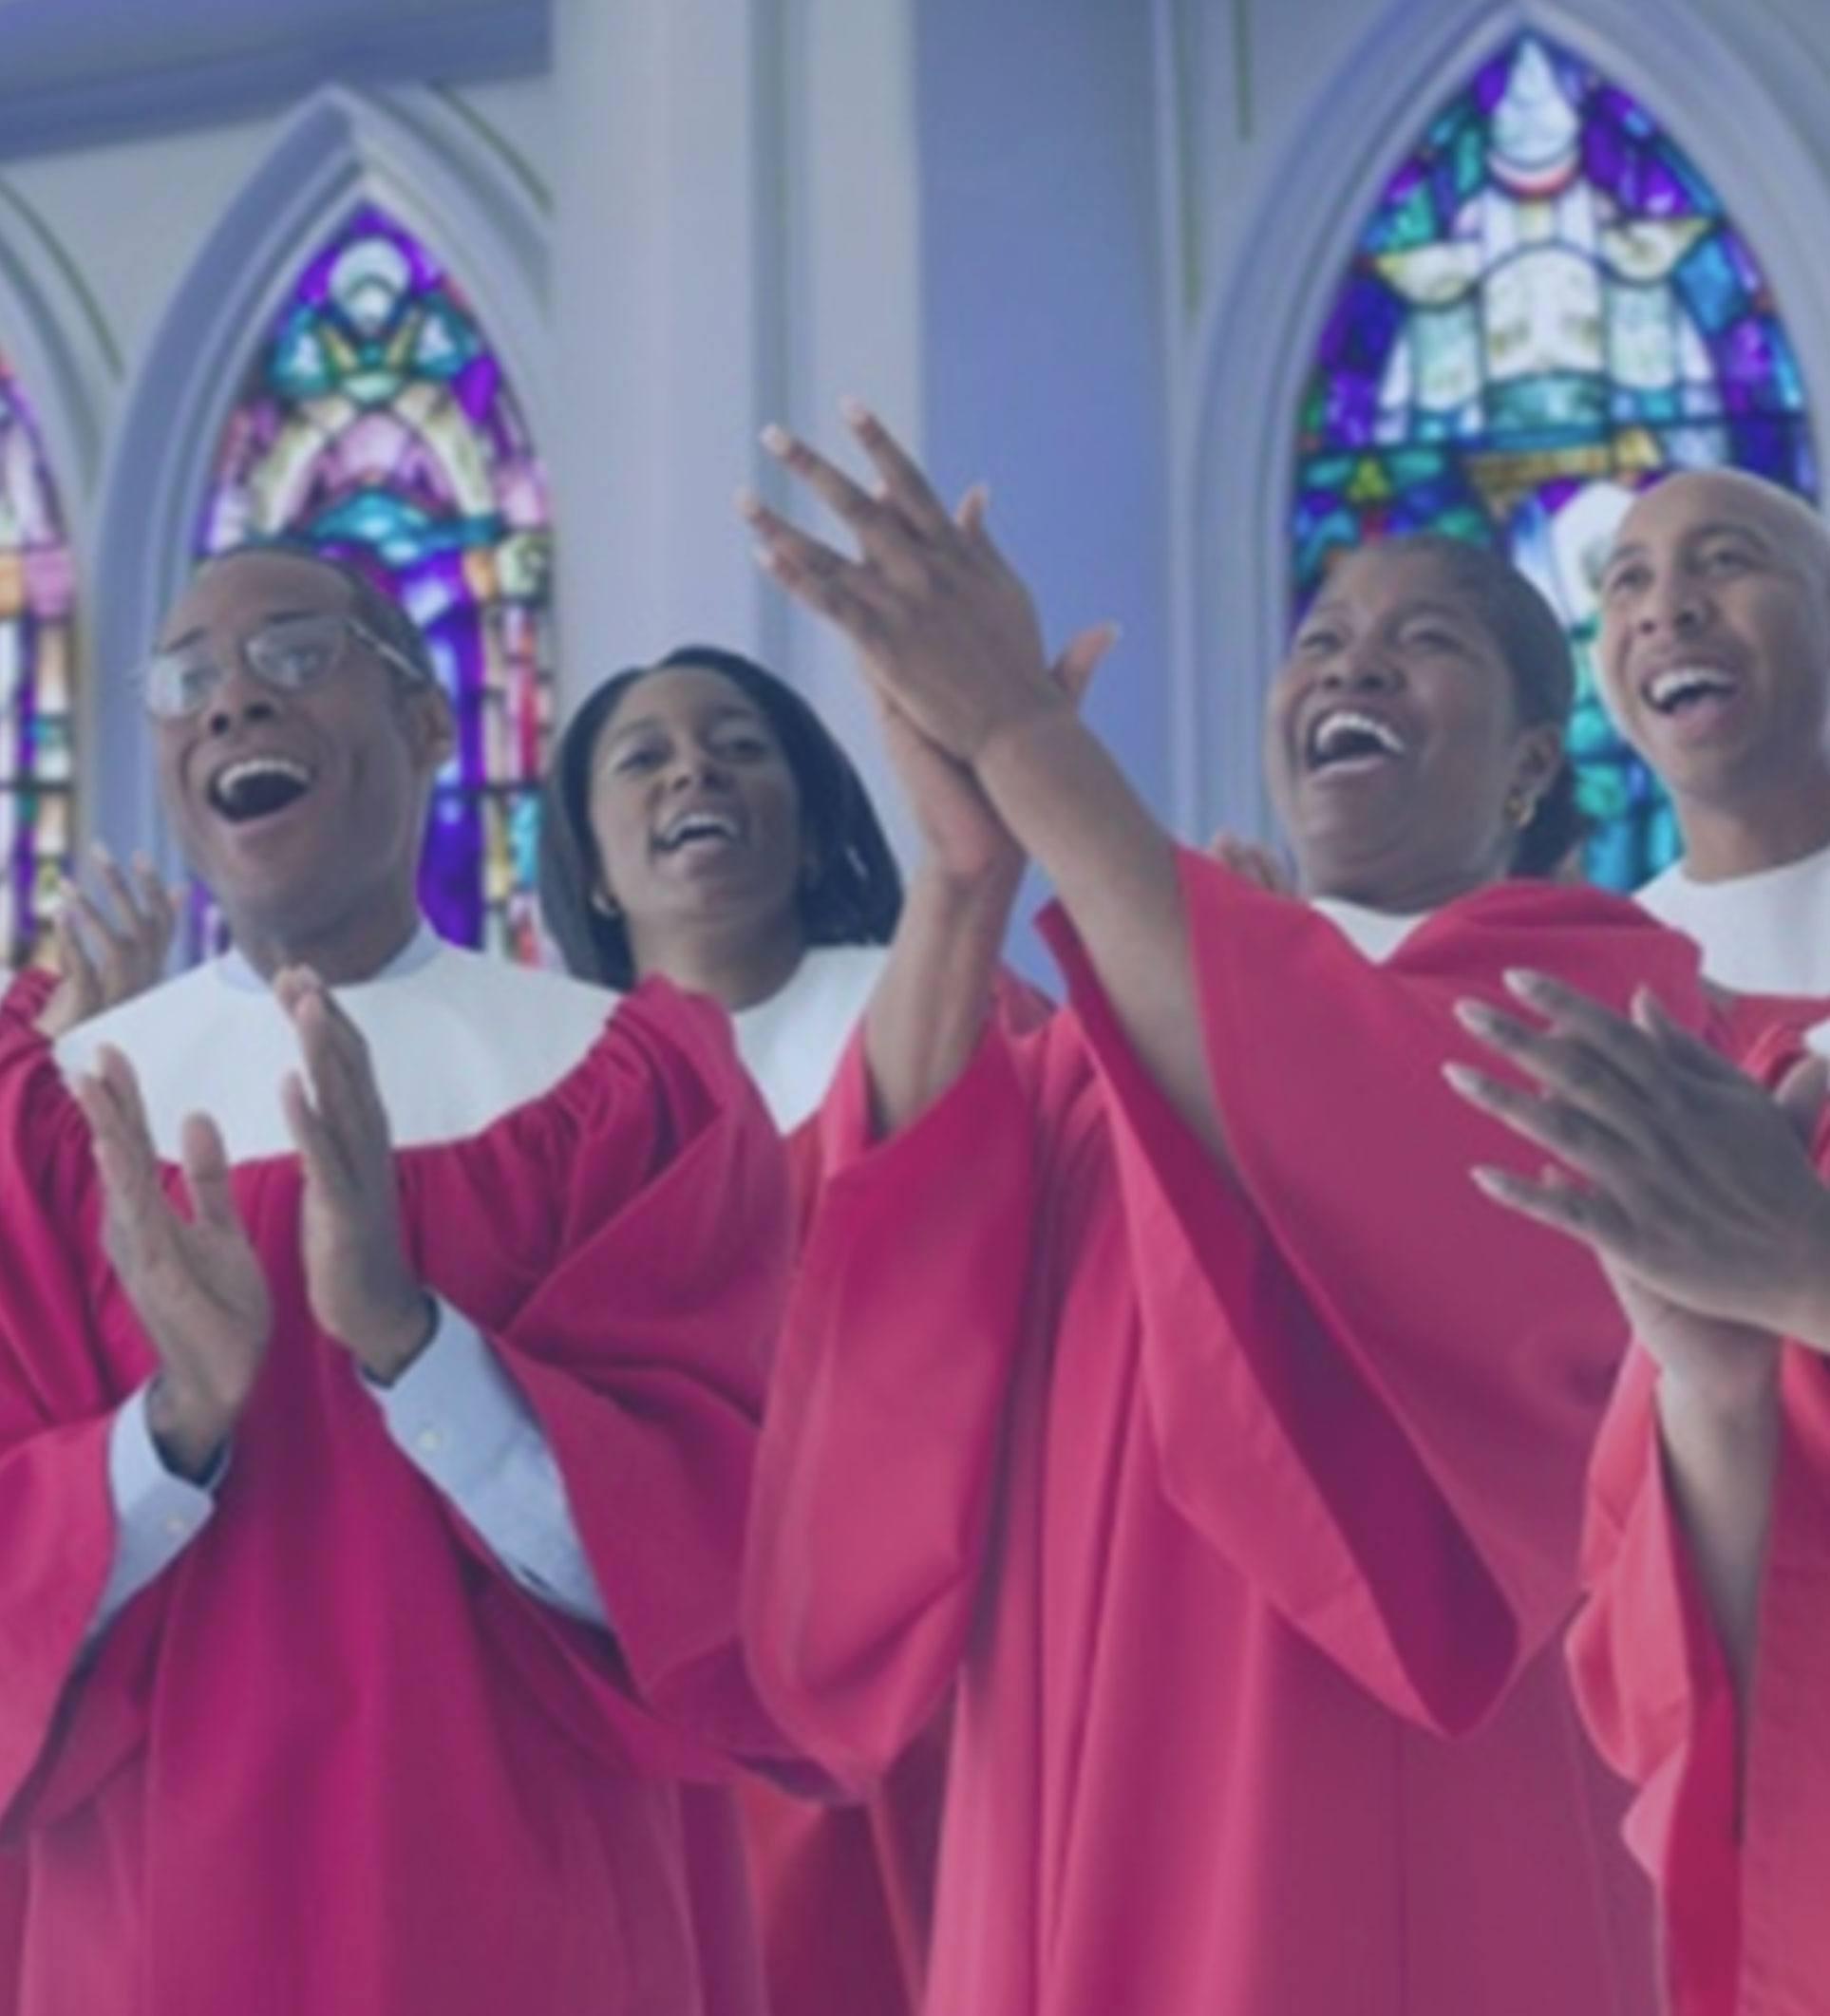 Church Fundraiser Ideas